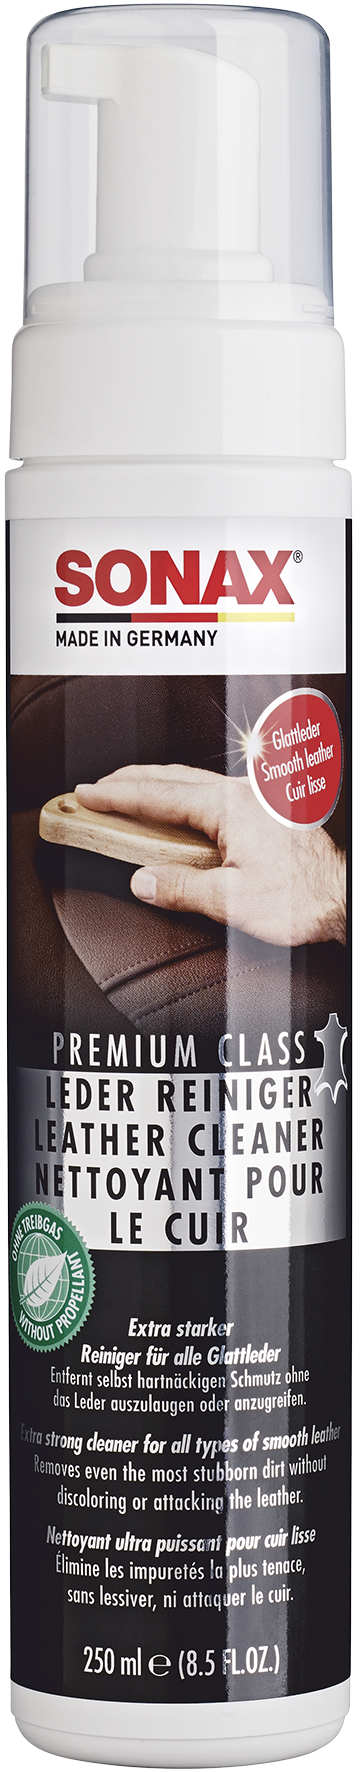 SONAX 02811410  PremiumClass LederReiniger 250 ml